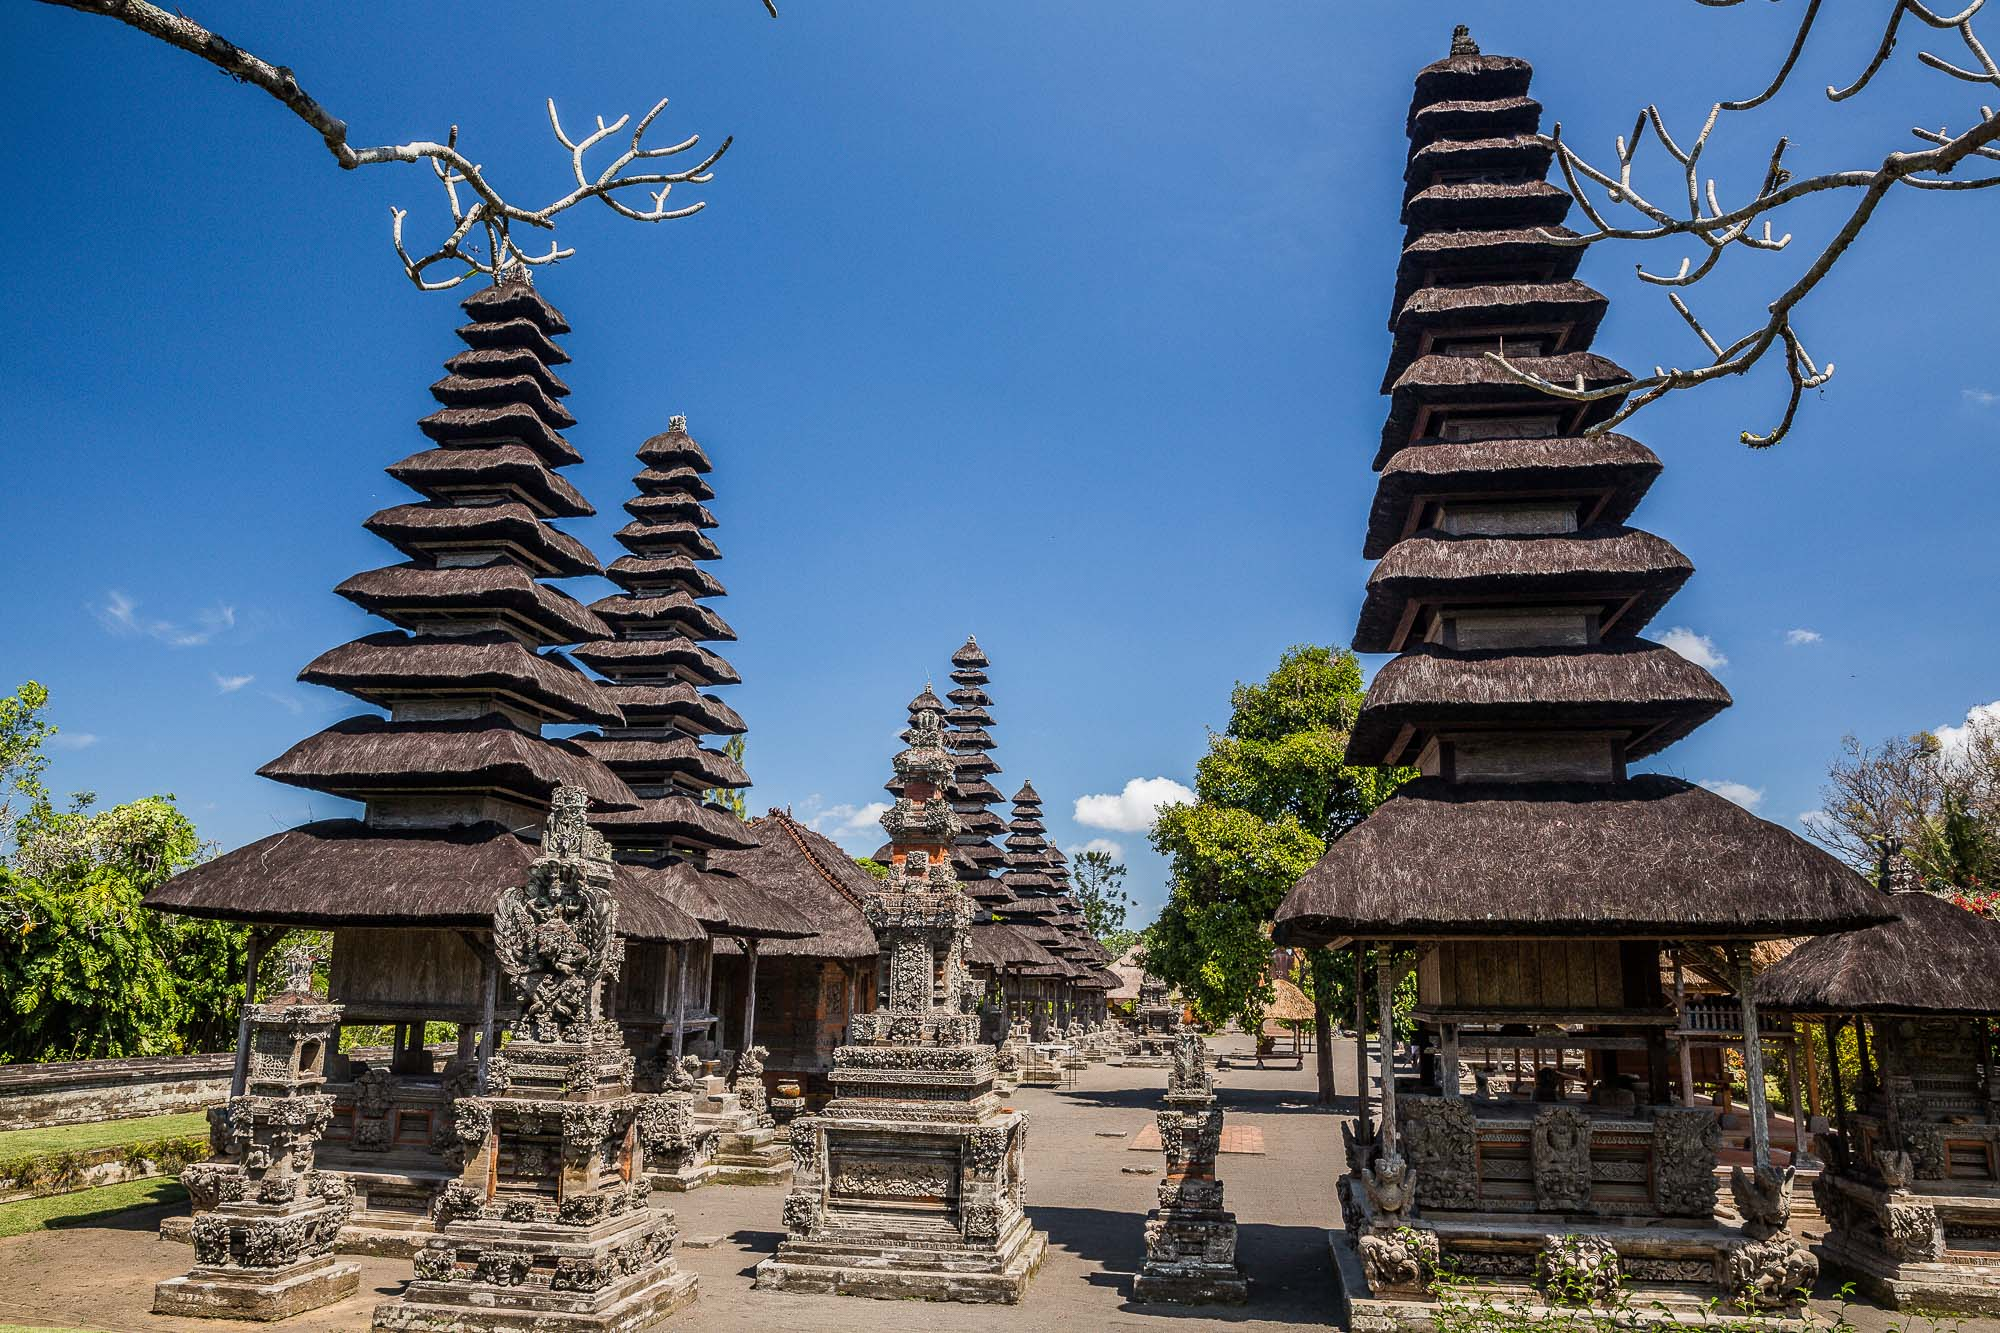 INDONESIA_2015_04 BALI_JusMedic_1185